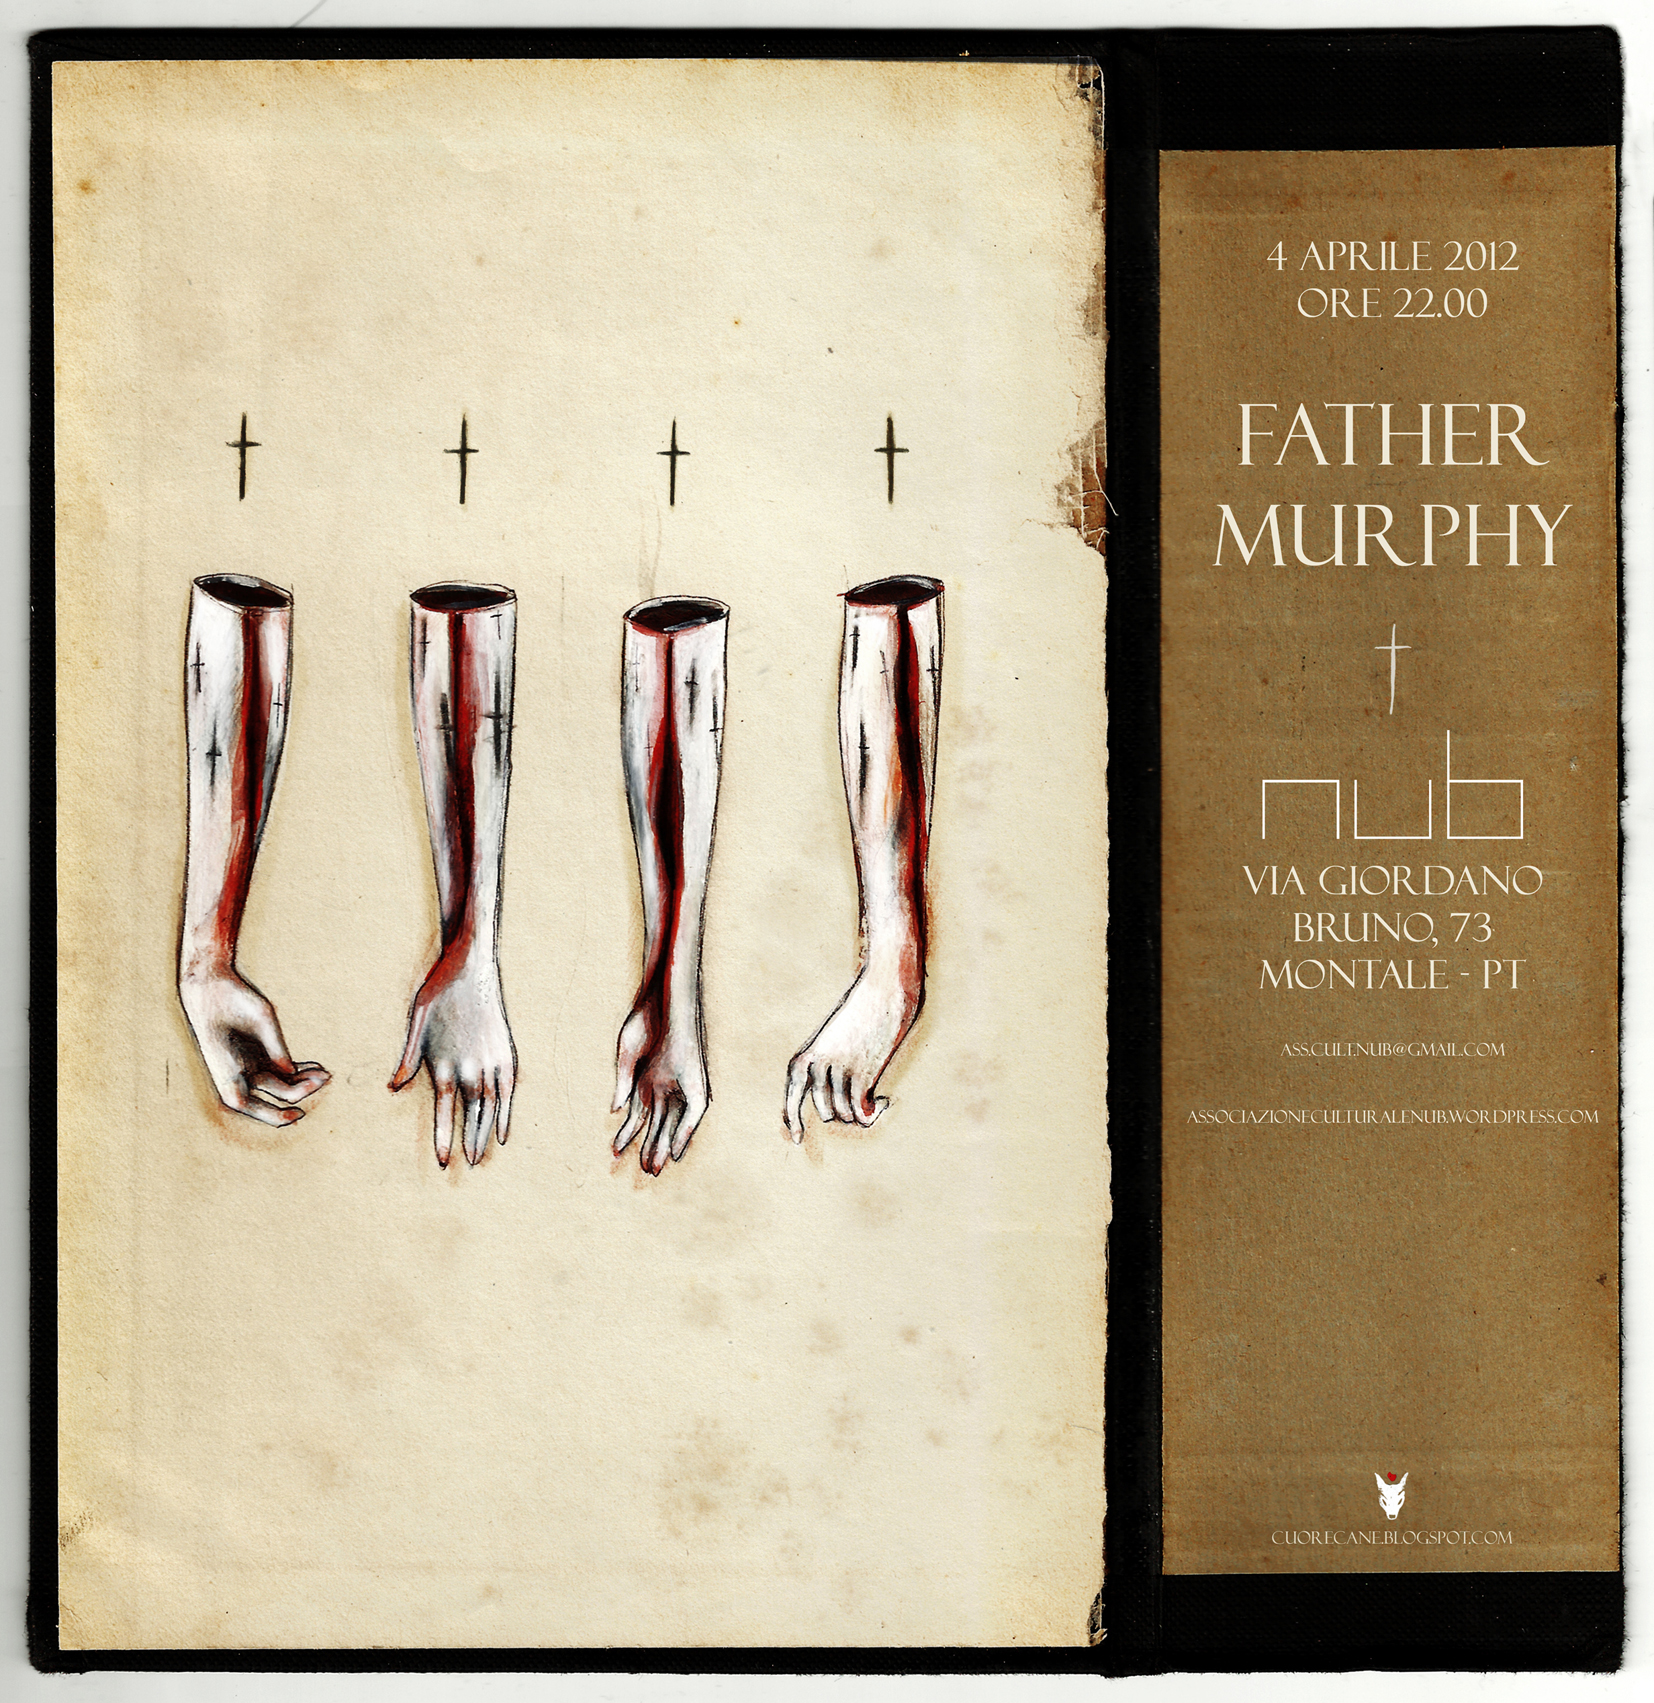 FATHER MURPHY | 04.04.2012